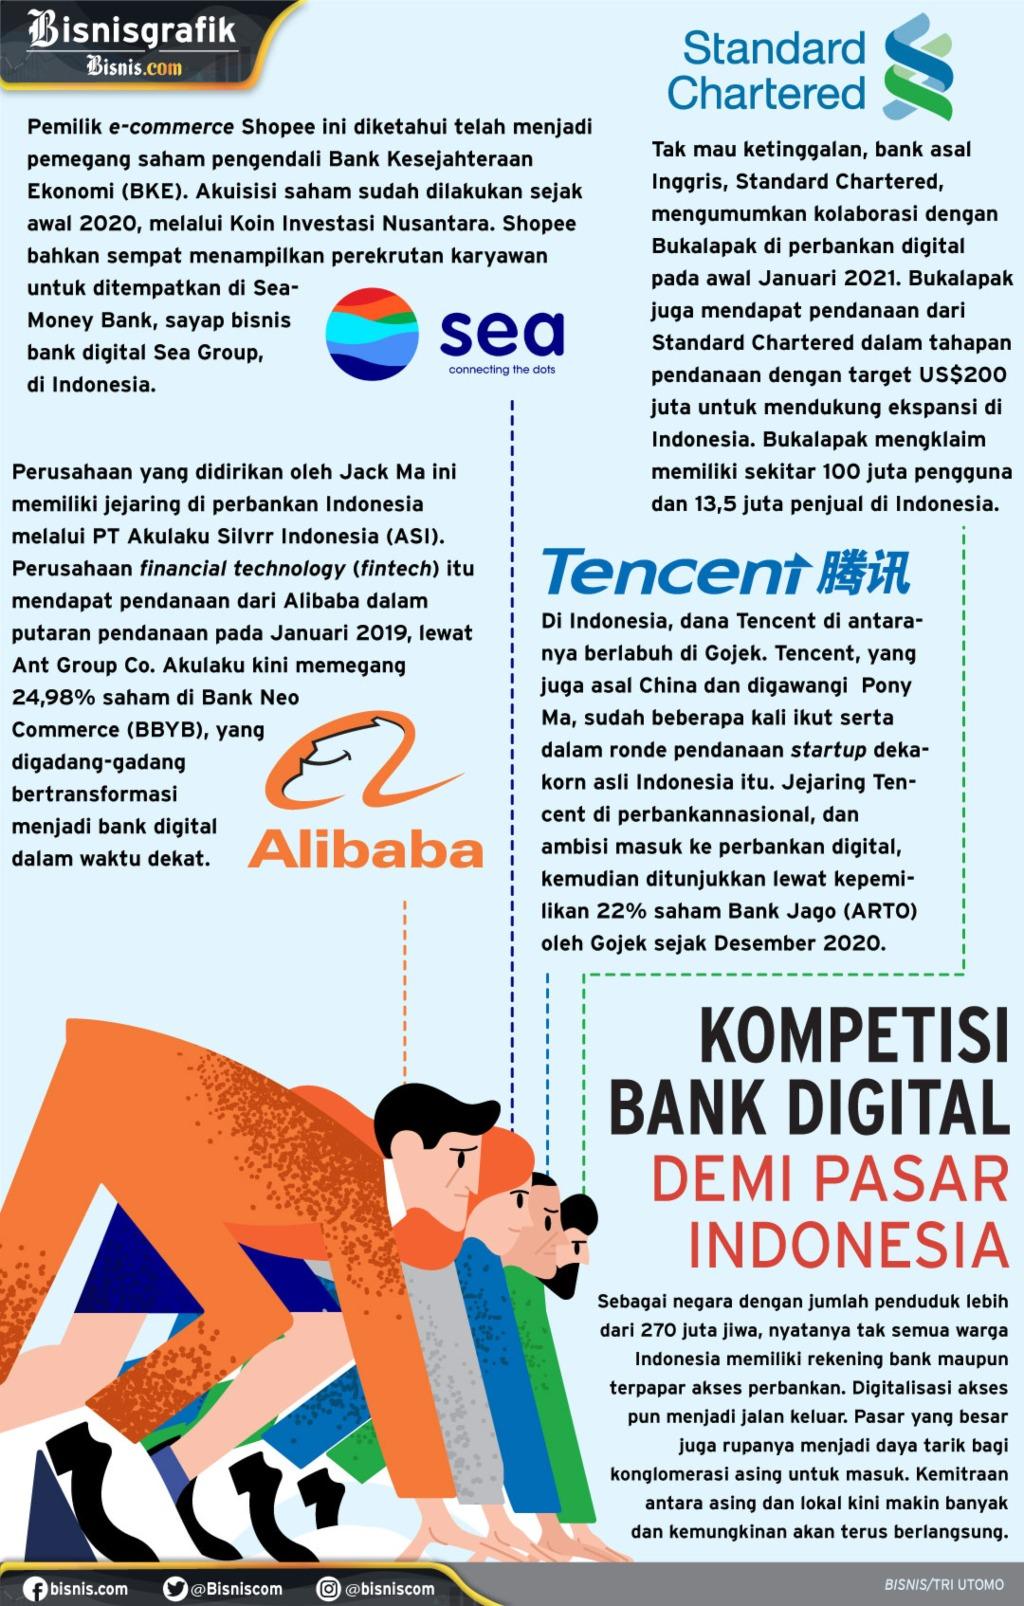 Bangun Kongsi Demi Mencicipi Kue Perbankan Digital di ...